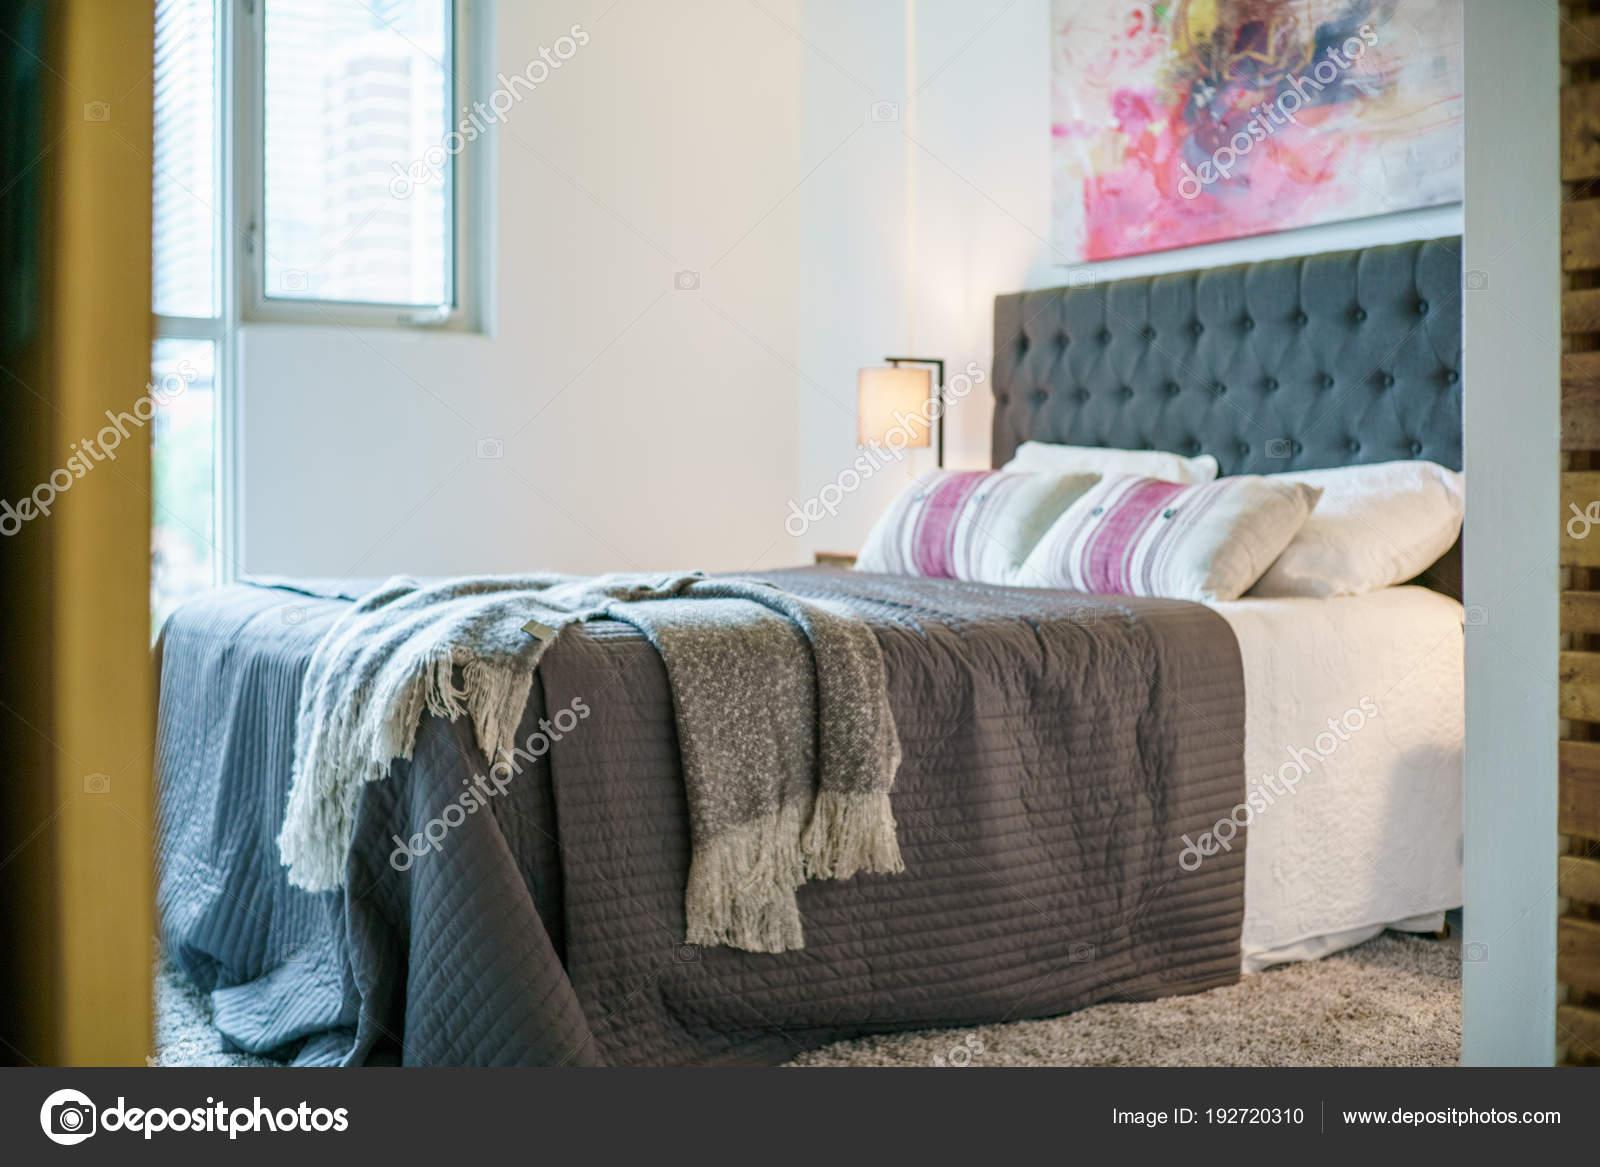 Modern Gezellig Interieur : Interieur van gezellige slaapkamer modern design u2014 stockfoto